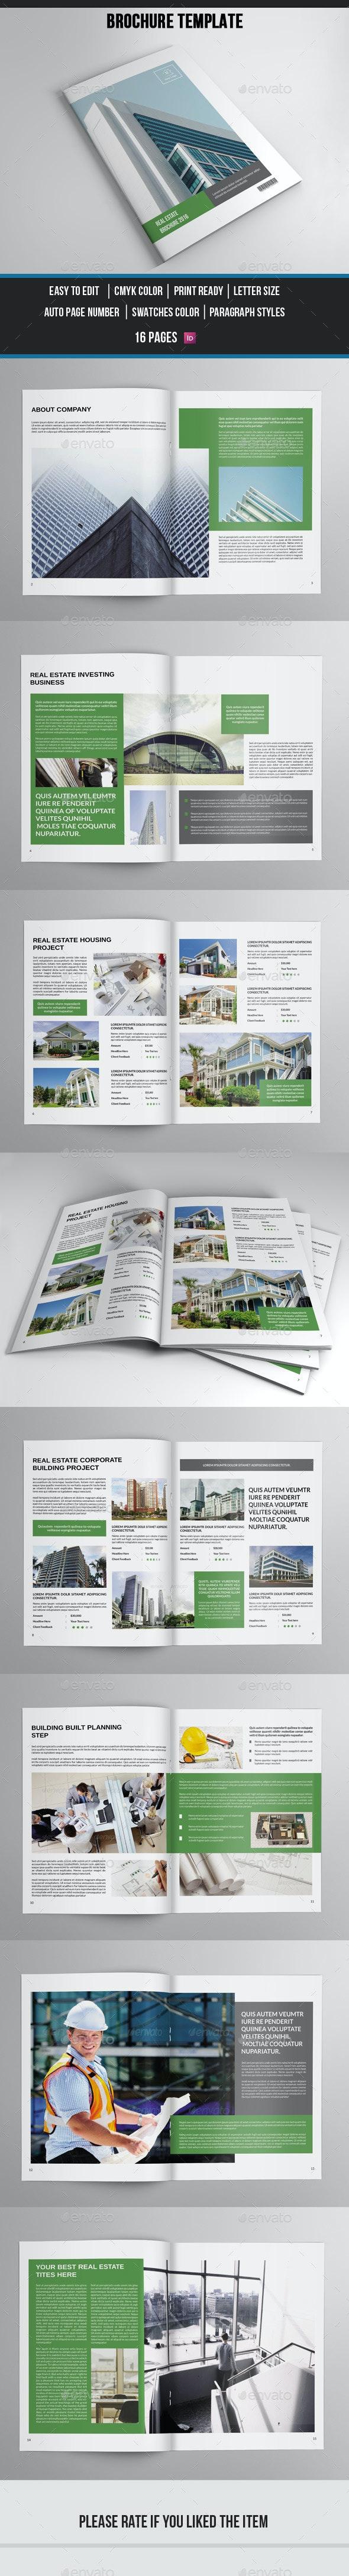 Real Estate Brochure Template-V402 - Corporate Brochures